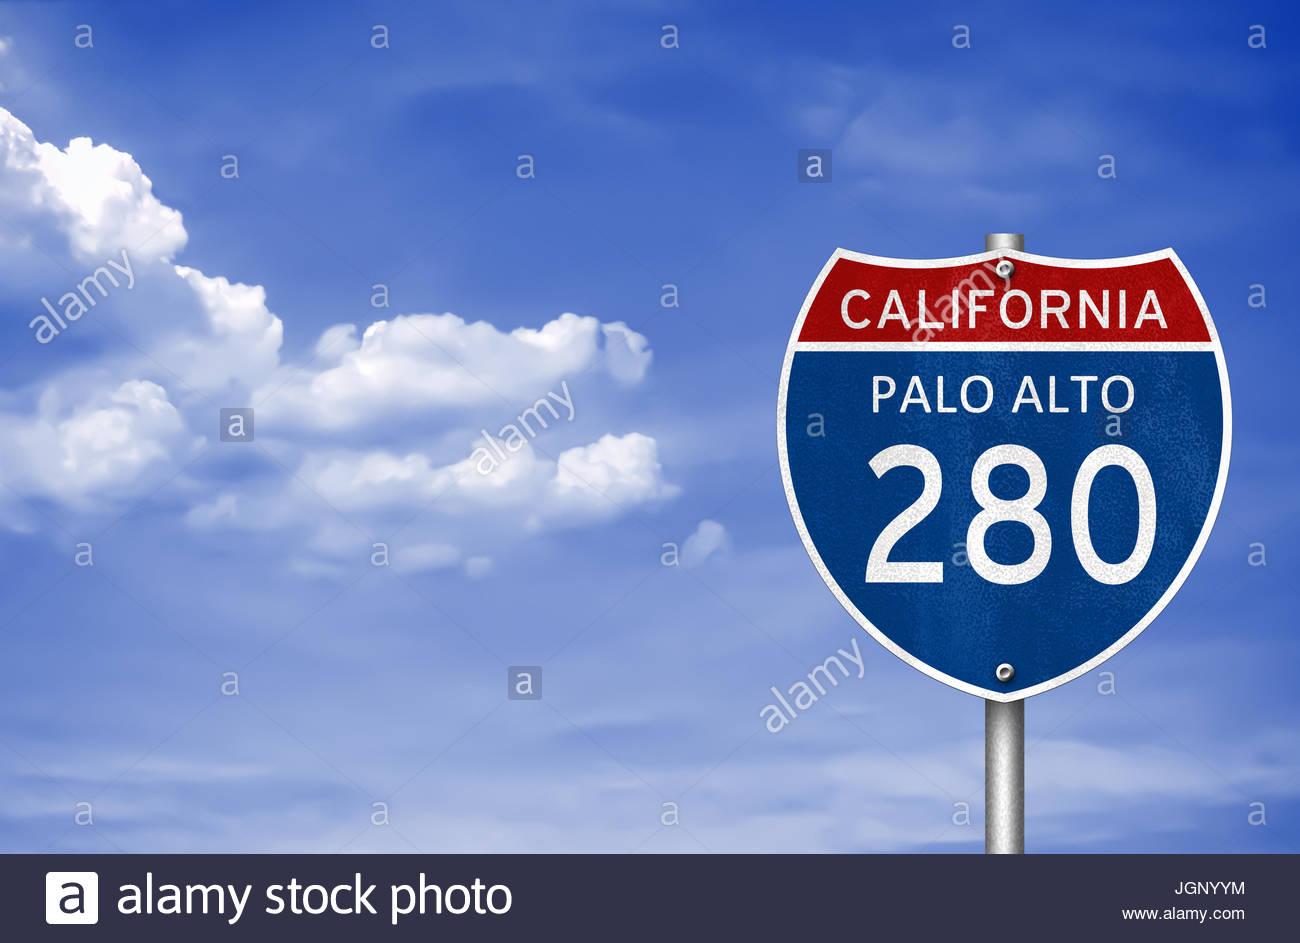 Palo alto california road sign stock photo royalty free image palo alto california road sign biocorpaavc